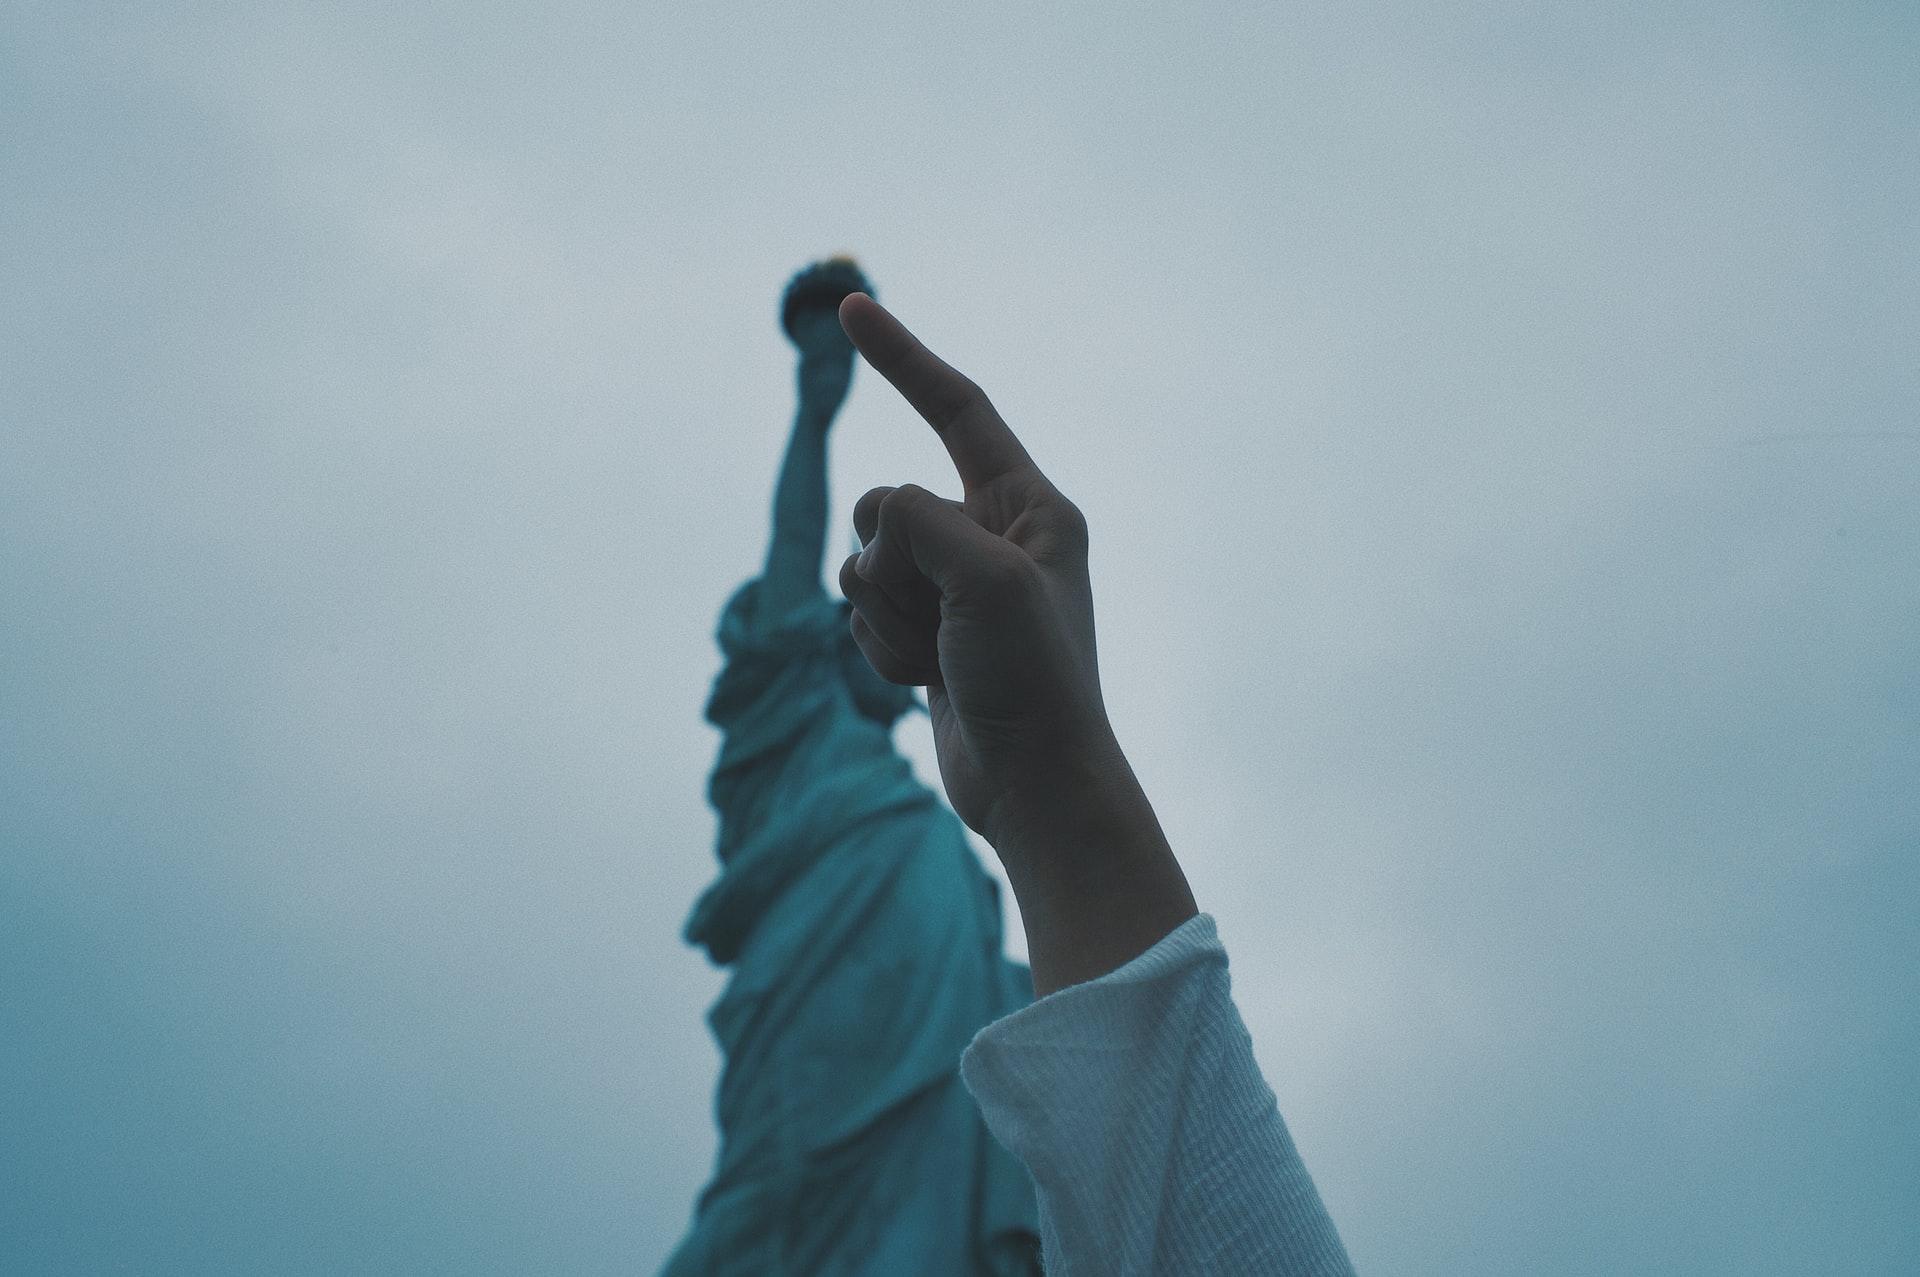 Photo Scavenger Hunt #5 - Famous Statue Poses